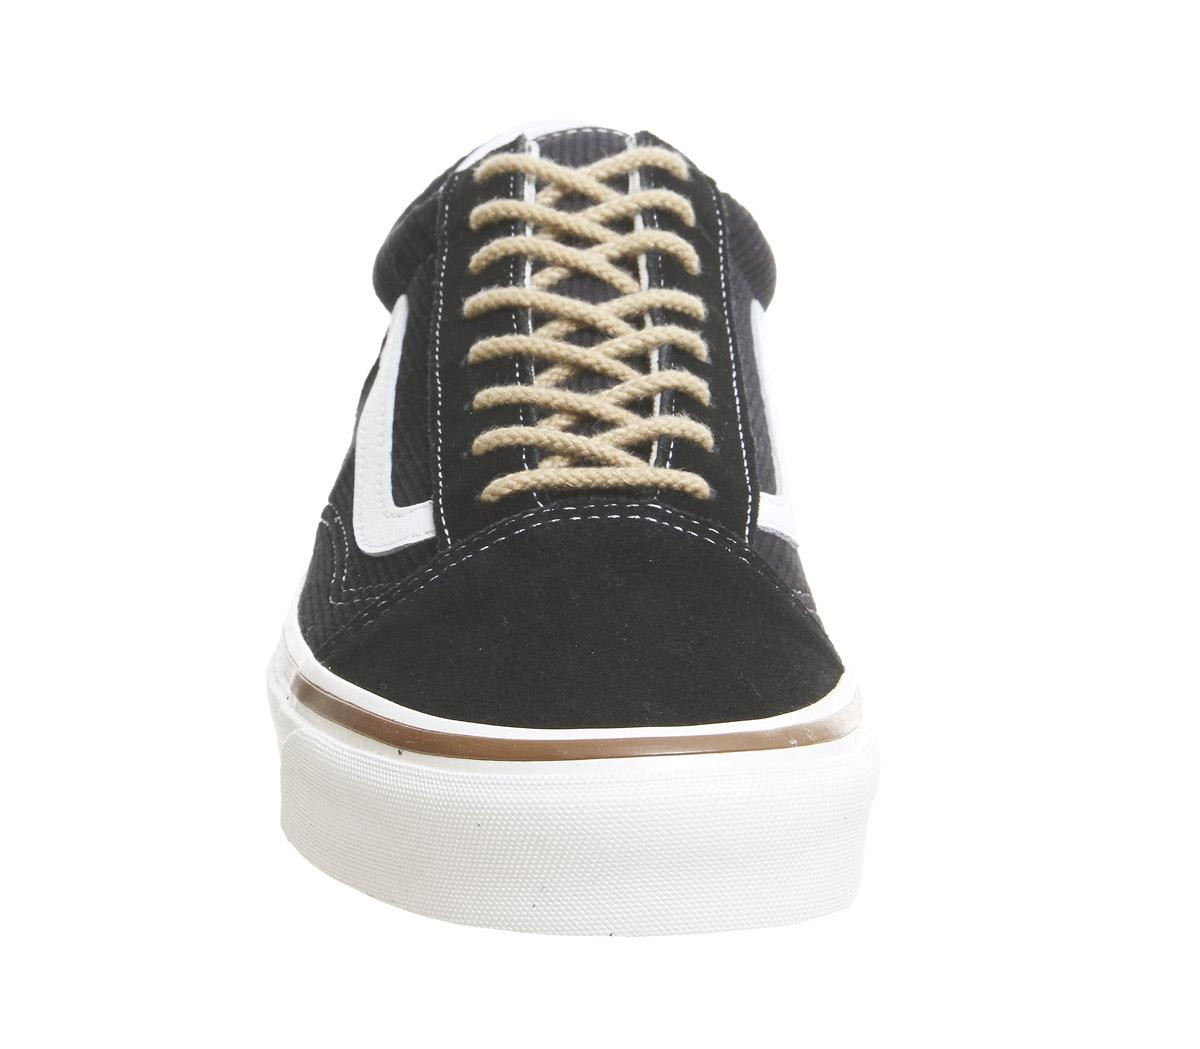 8094e5bc381 Vans - Black Old Skool Dx Trainers for Men - Lyst. View fullscreen